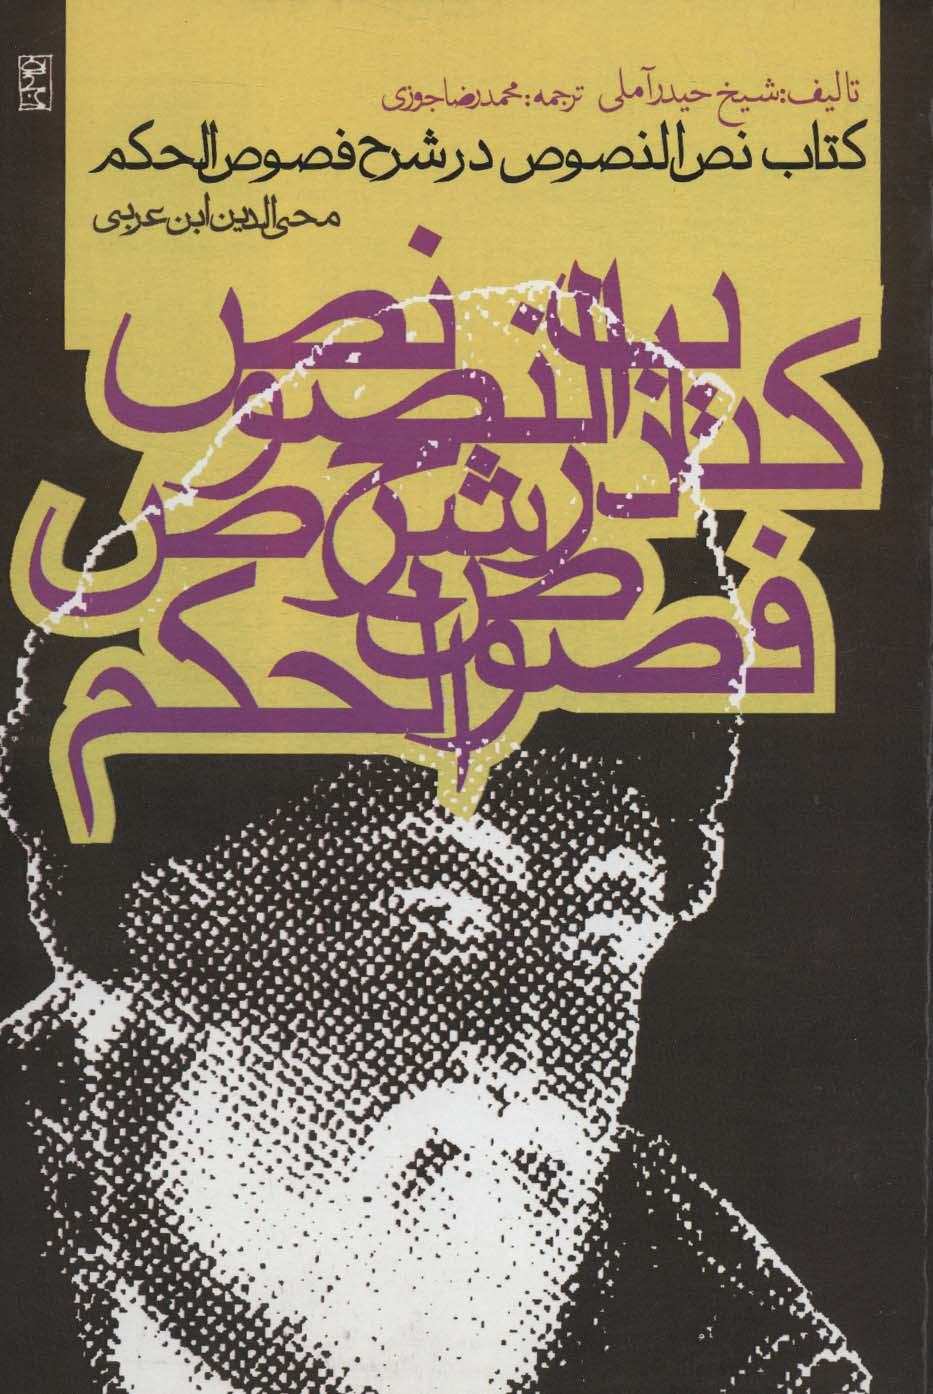 کتاب نص النصوص در شرح فصوص الحکم محی الدین بن عربی